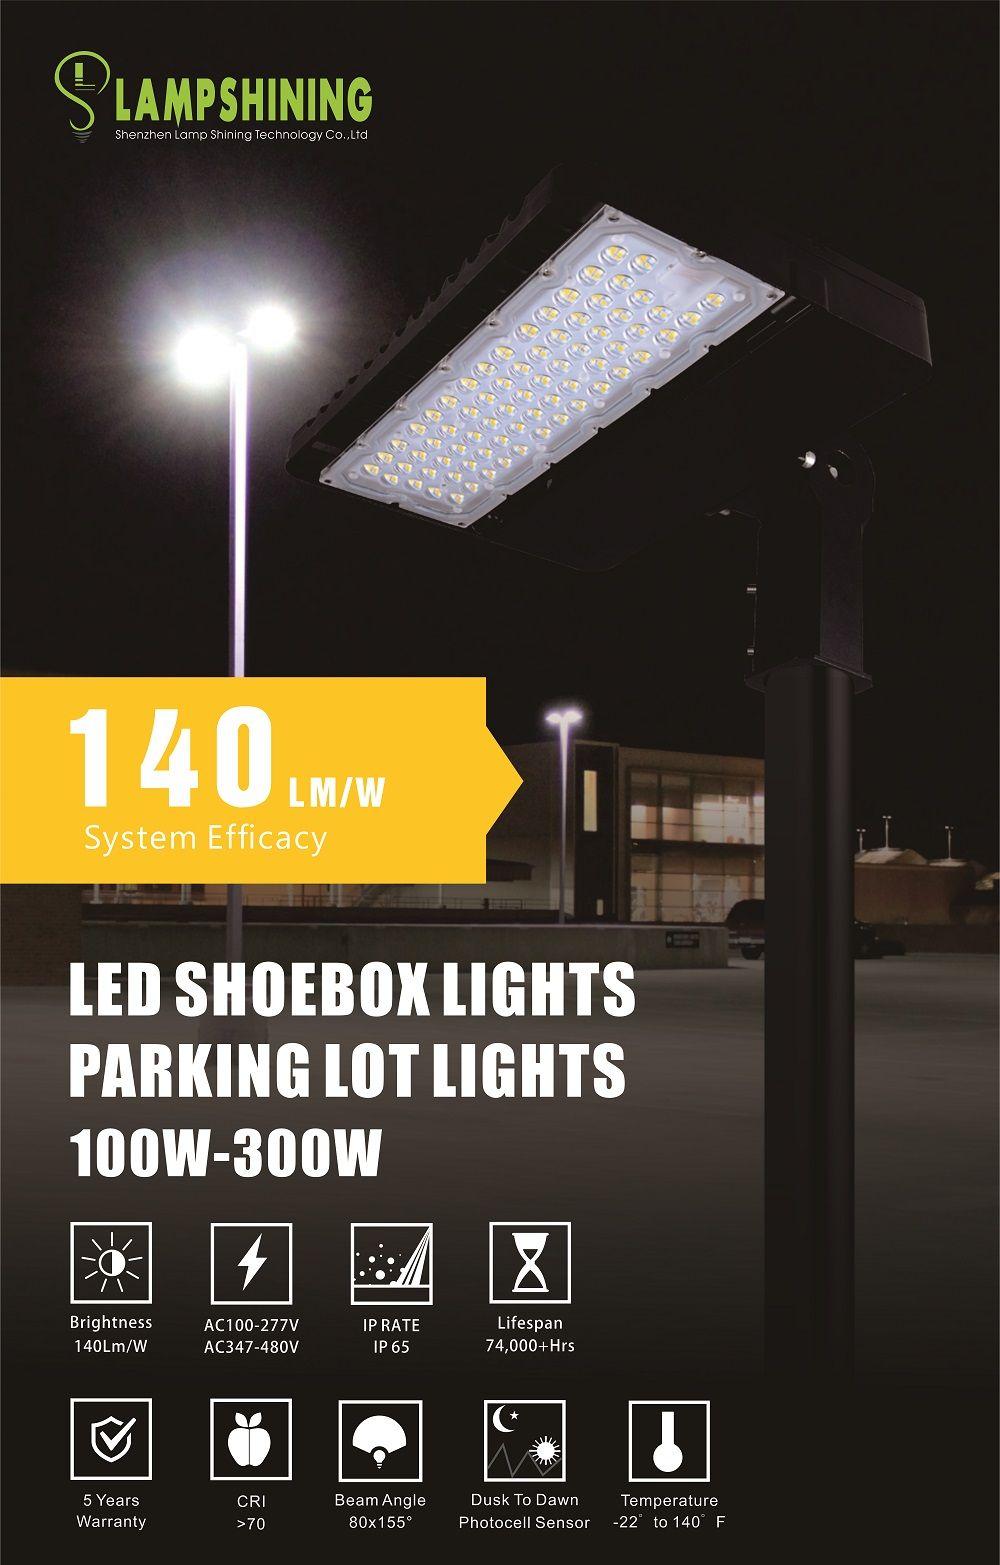 Led Shoebox Area Light Fixtures Twist Lock Photocell Led Parking Lot Lights Outdoor Post Lights Light Fixtures